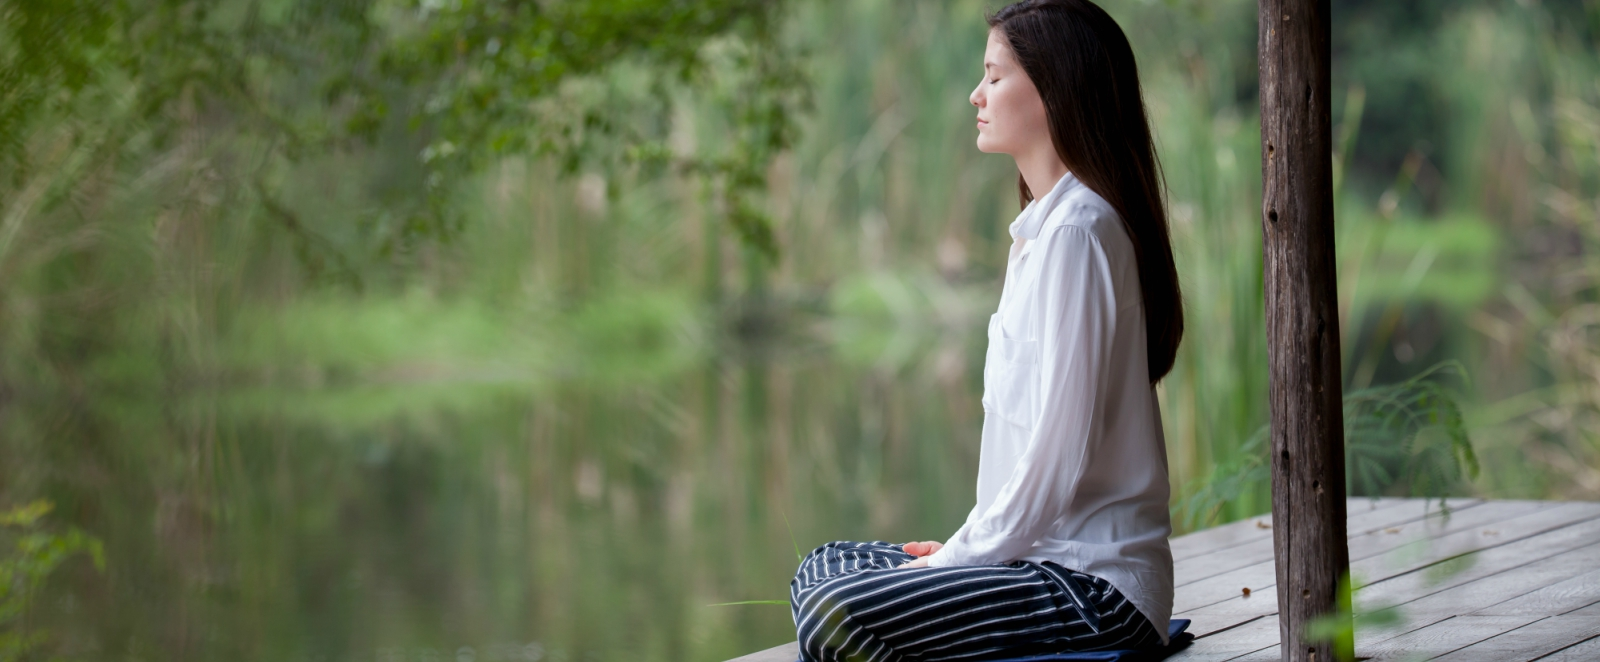 Which meditation technique is the best, Sudarshan Kriya, Vipassana, Isha Kriya or Transcendental Meditation? 3